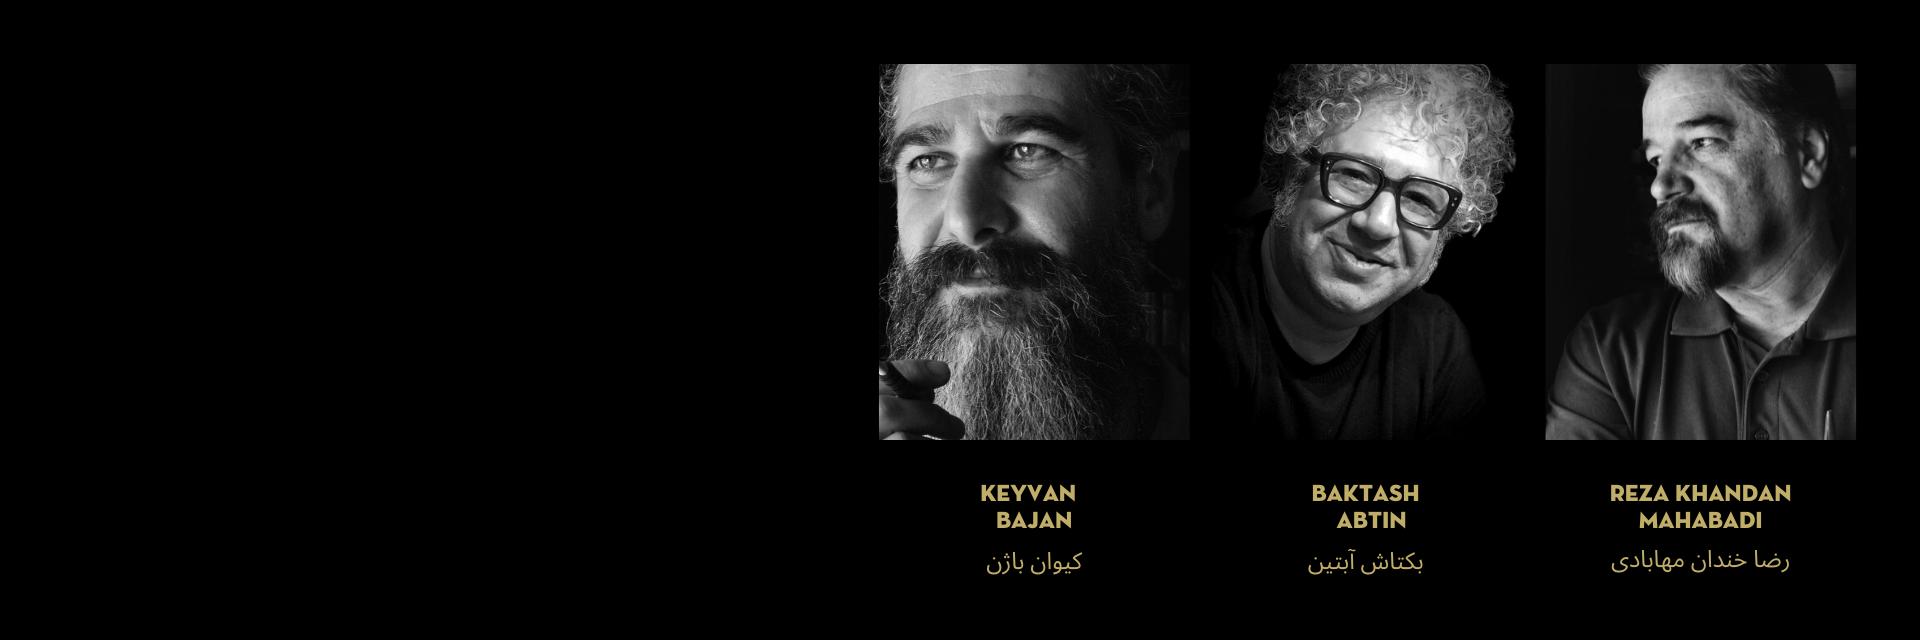 Headshots and names of Keyvan Bajan, Baktash Abtin, and Reza Khandan Mahabadi